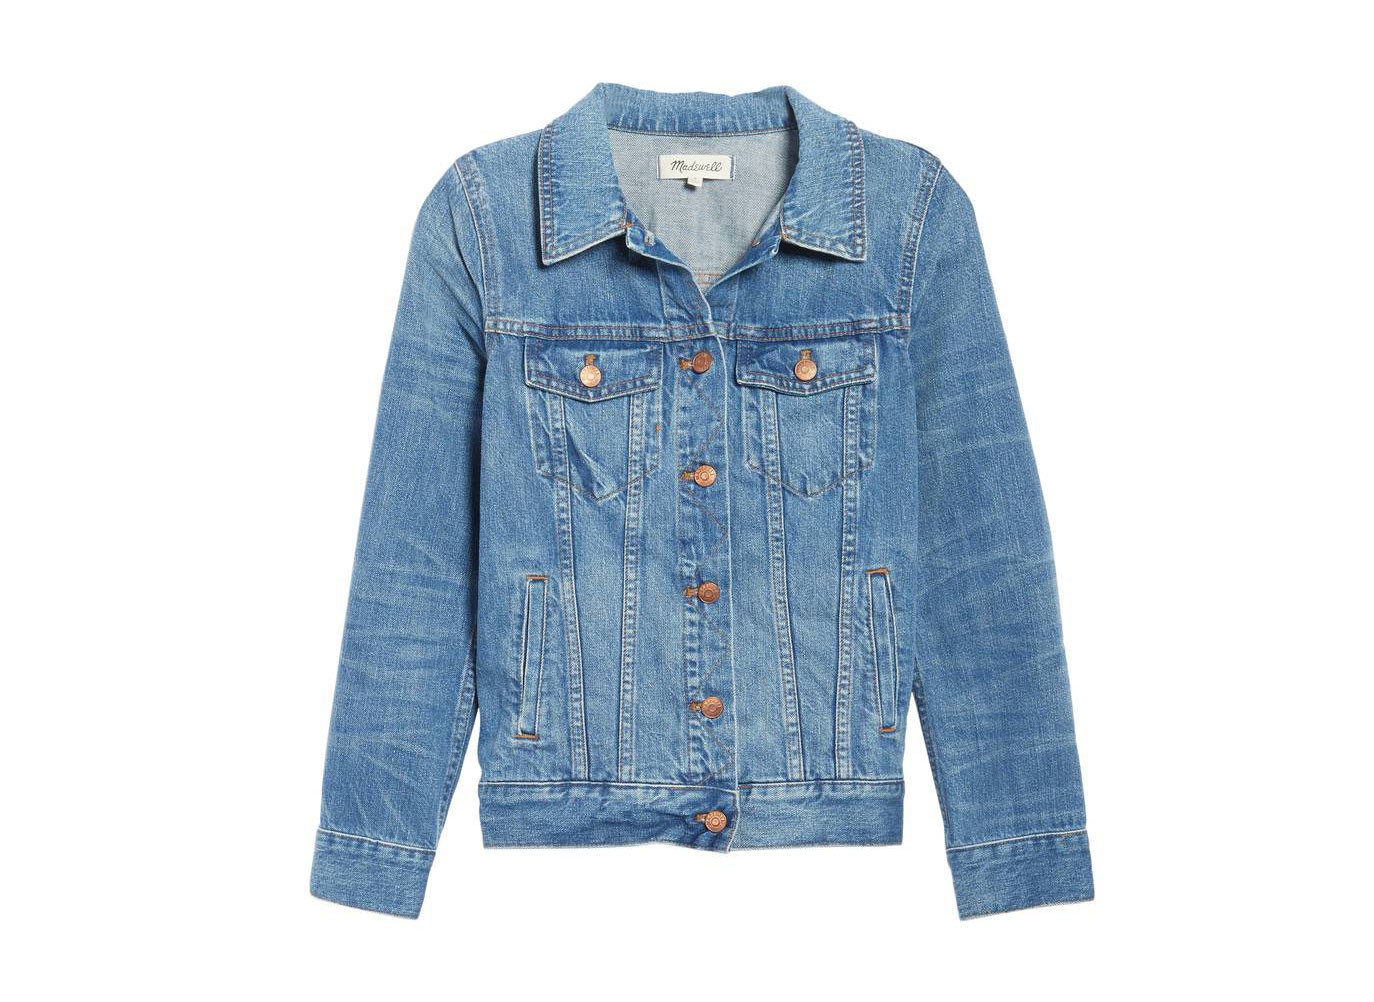 Style + Design Travel Shop denim jacket outerwear button jeans textile sleeve pocket product